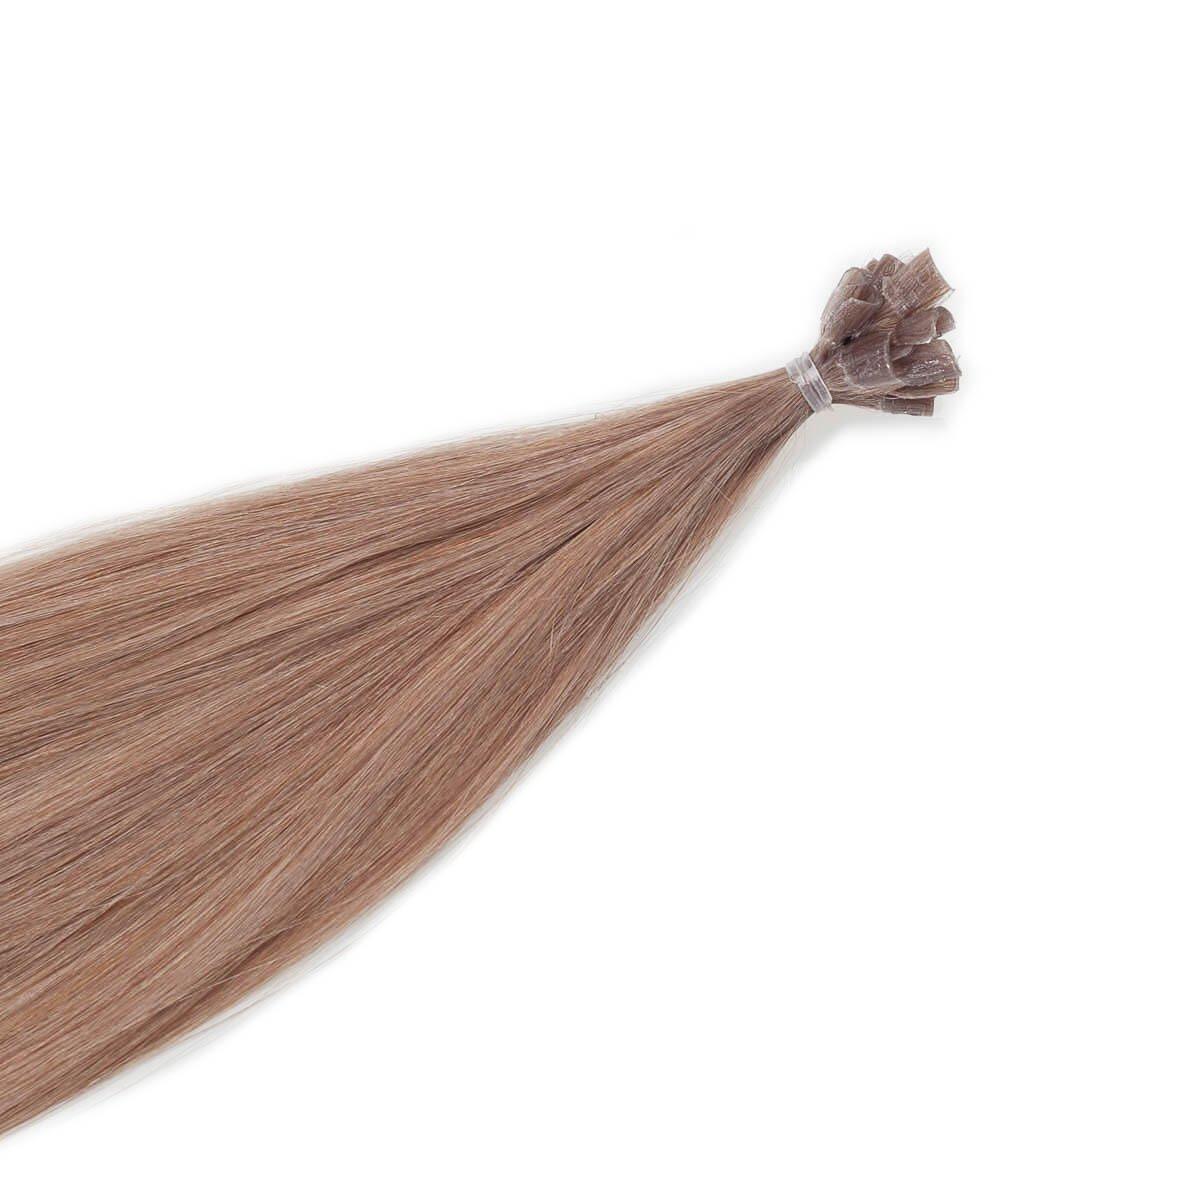 Nail Hair Original 7.1 Natural Ash 50 cm